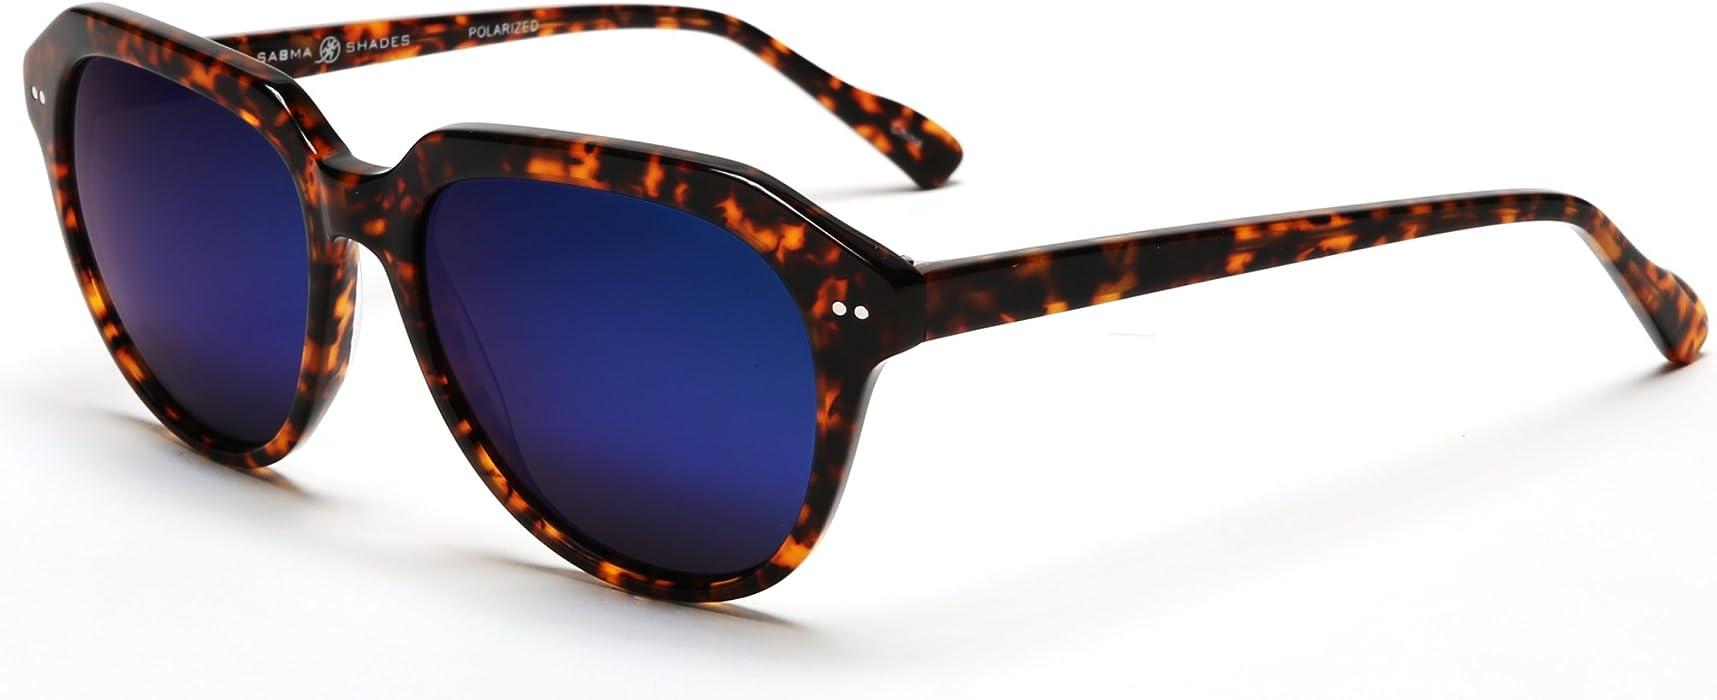 b06c44e2c6 Samba Shades Women s Polarized Jackie O  New Classic Fashion Sunglasses  with Brown Tortoise Shell Frame